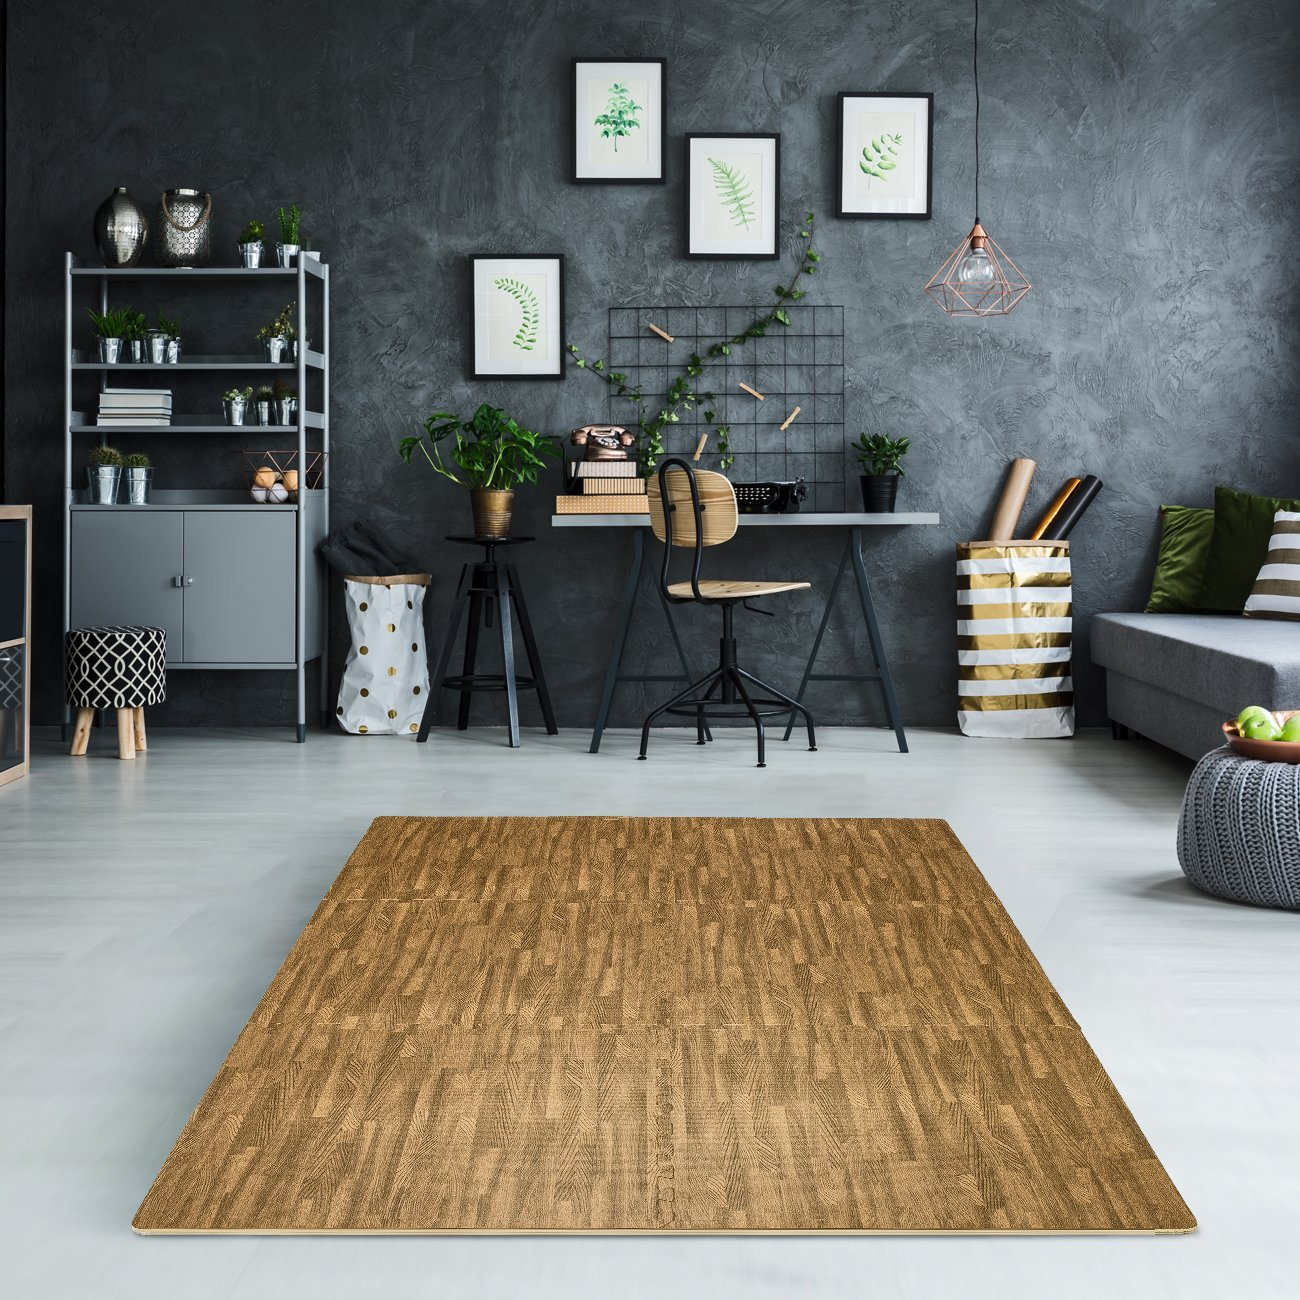 Sorbus Interlocking Floor Mat Print, Wood Grain - Light (6-Piece) by Sorbus (Image #3)